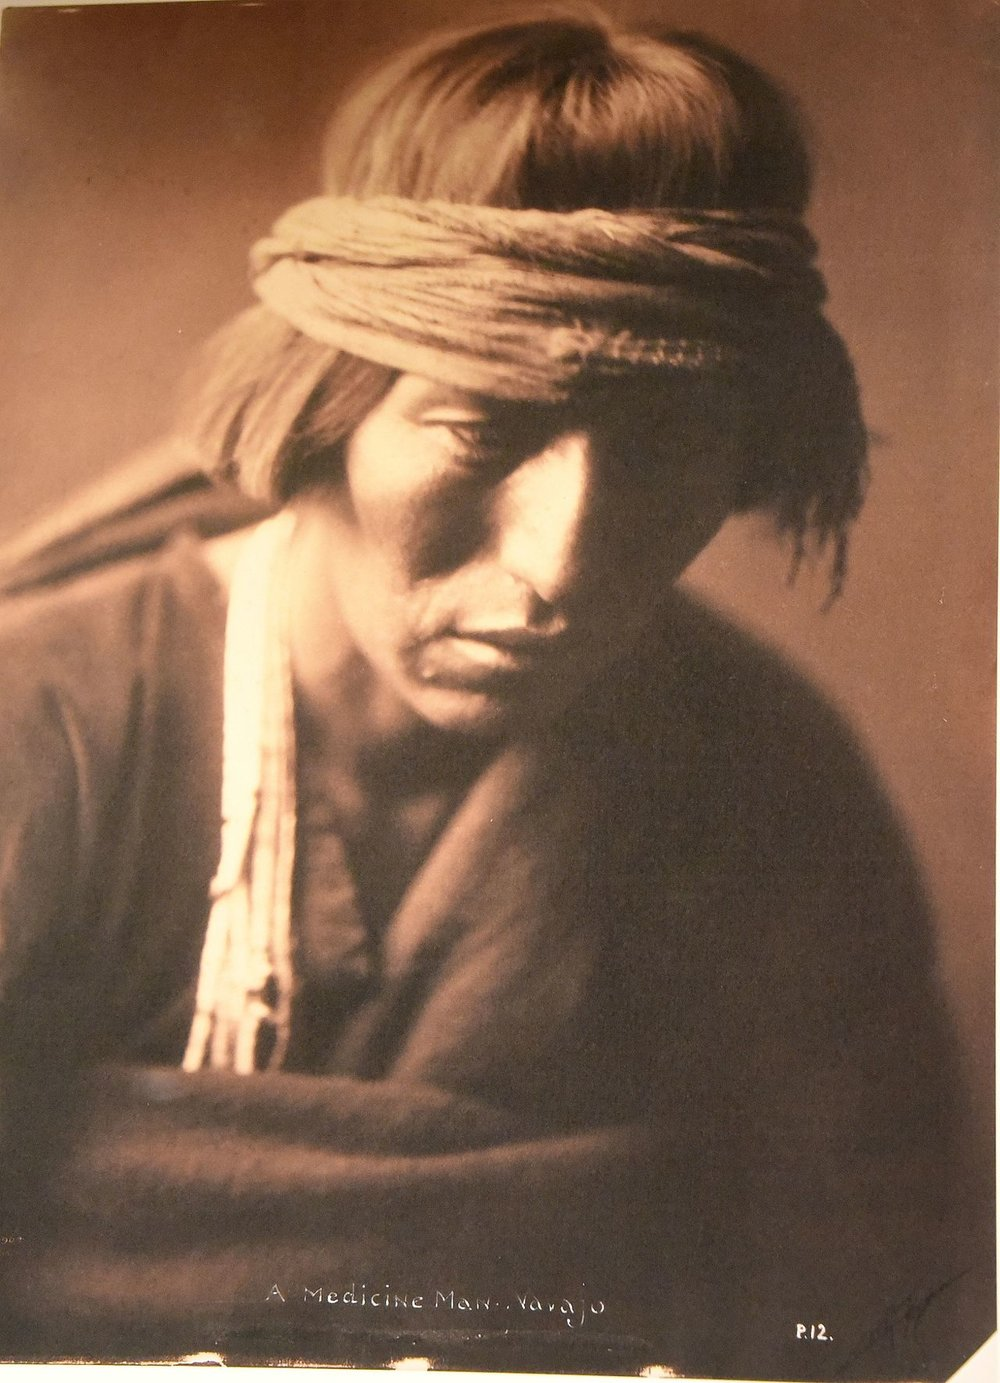 A_Navajo_medicine_man._Edward_S._Curtis._USA,_1900._The_Wellcome_Collection,_London.jpg